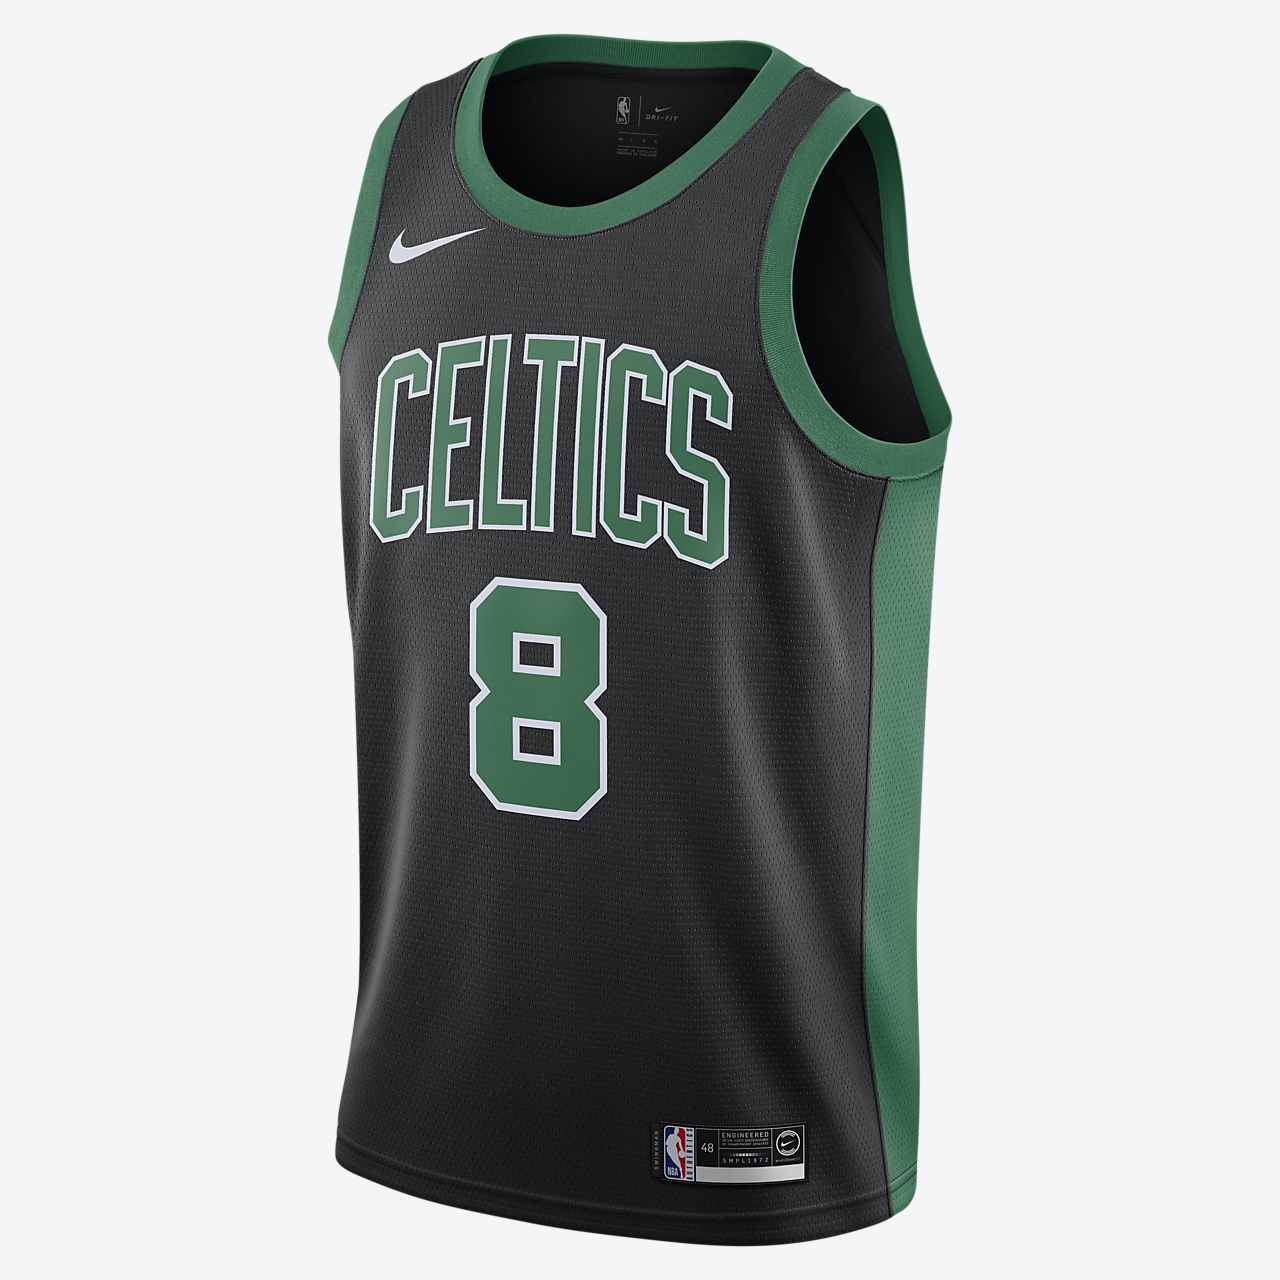 Kemba Walker Celtics Statement Edition Nike NBA Swingman Trikot